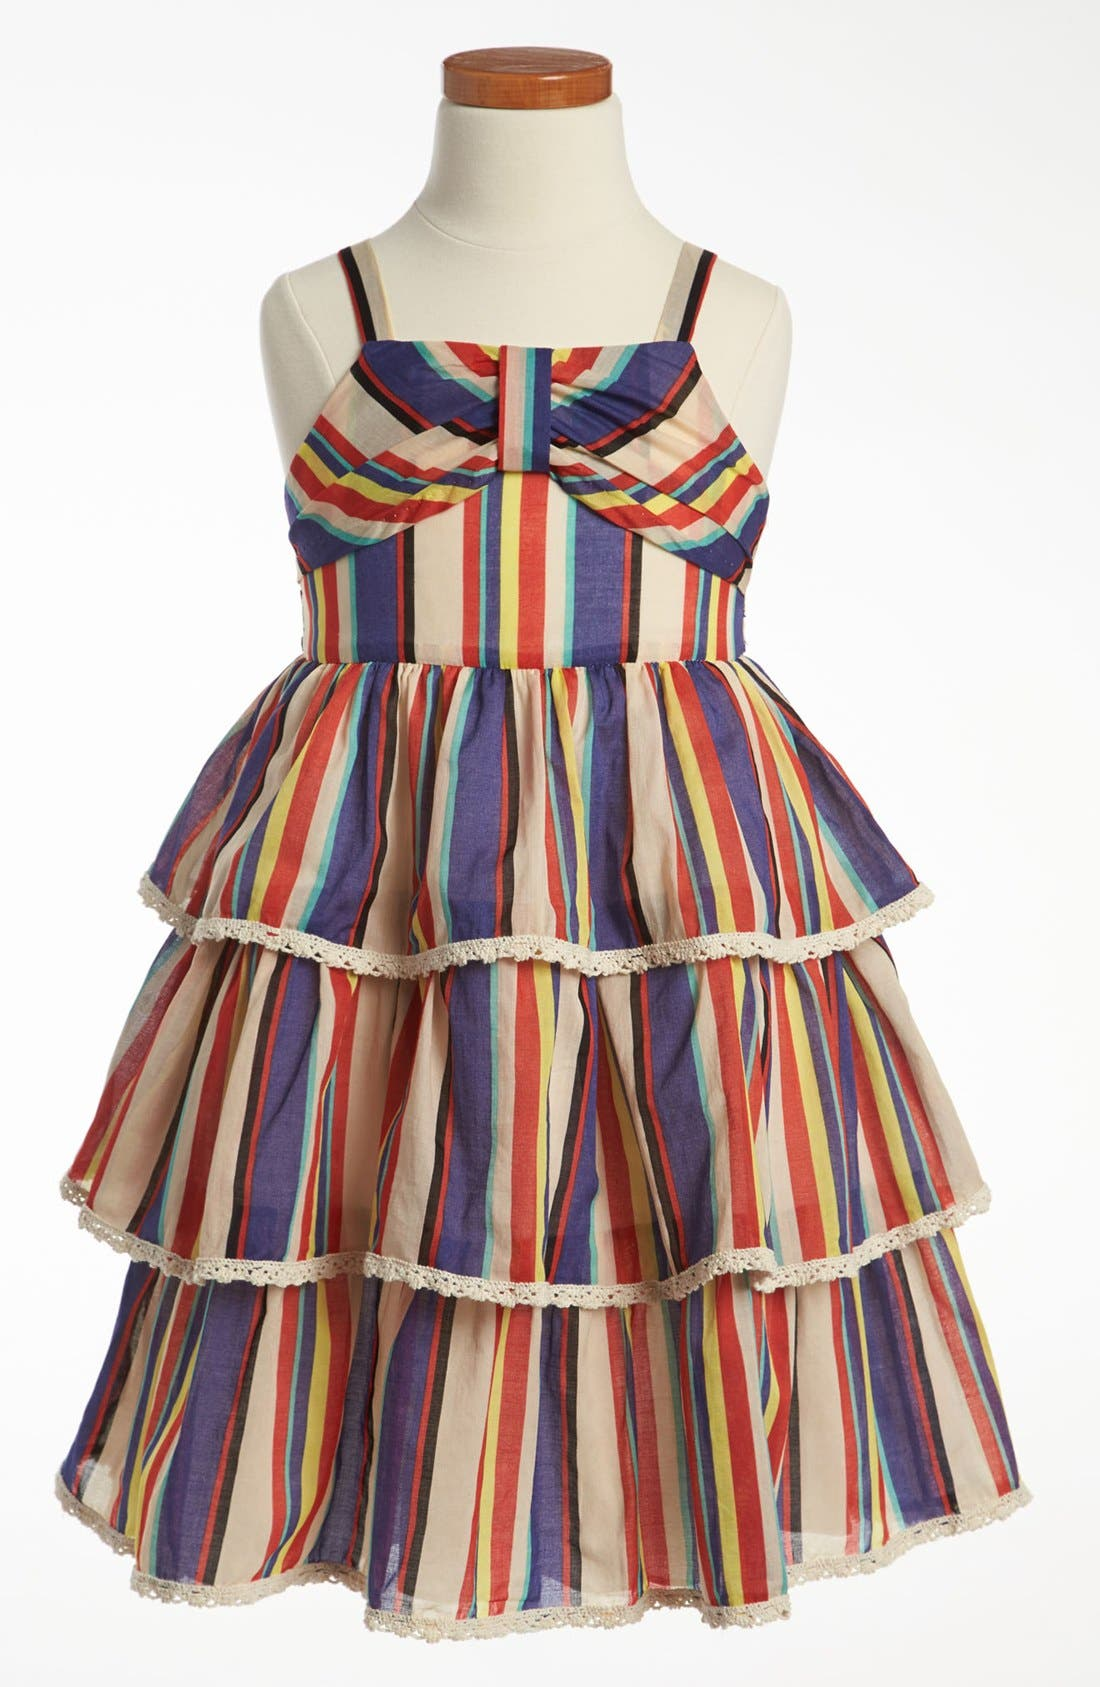 Alternate Image 1 Selected - Pippa & Julie Stripe Dress (Little Girls & Big Girls)